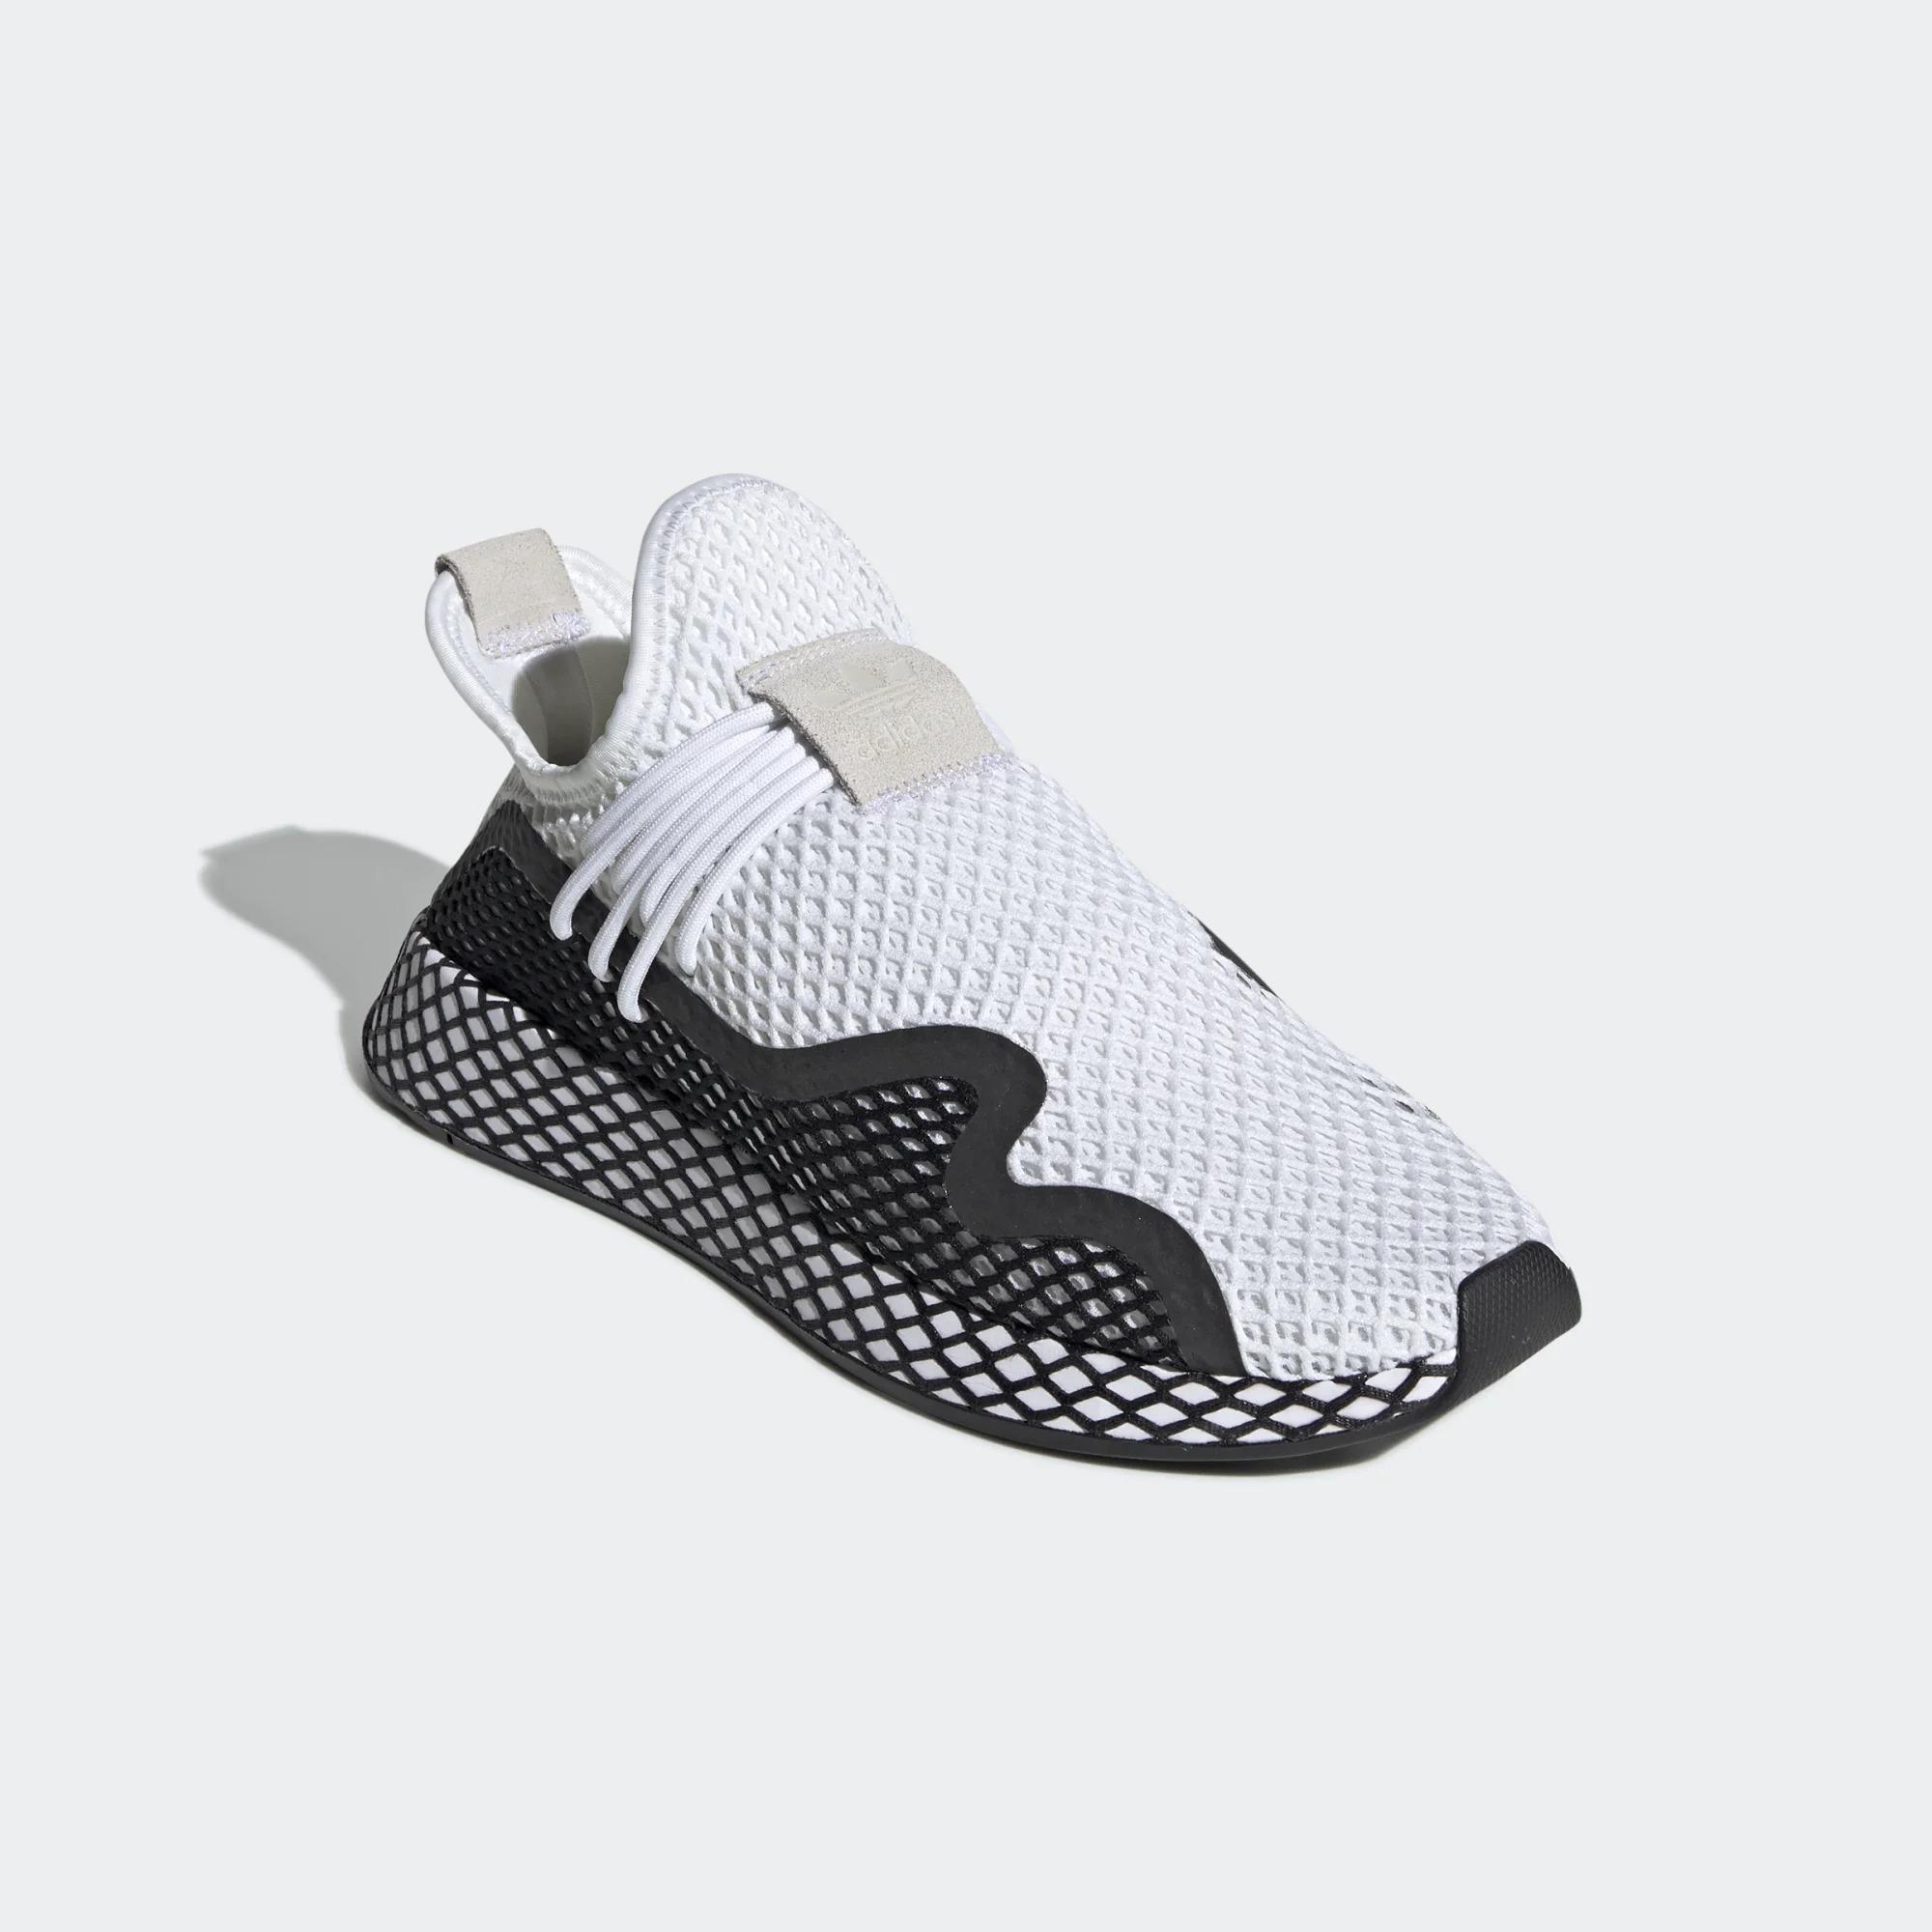 BD7874 adidas Deerupt S White 4